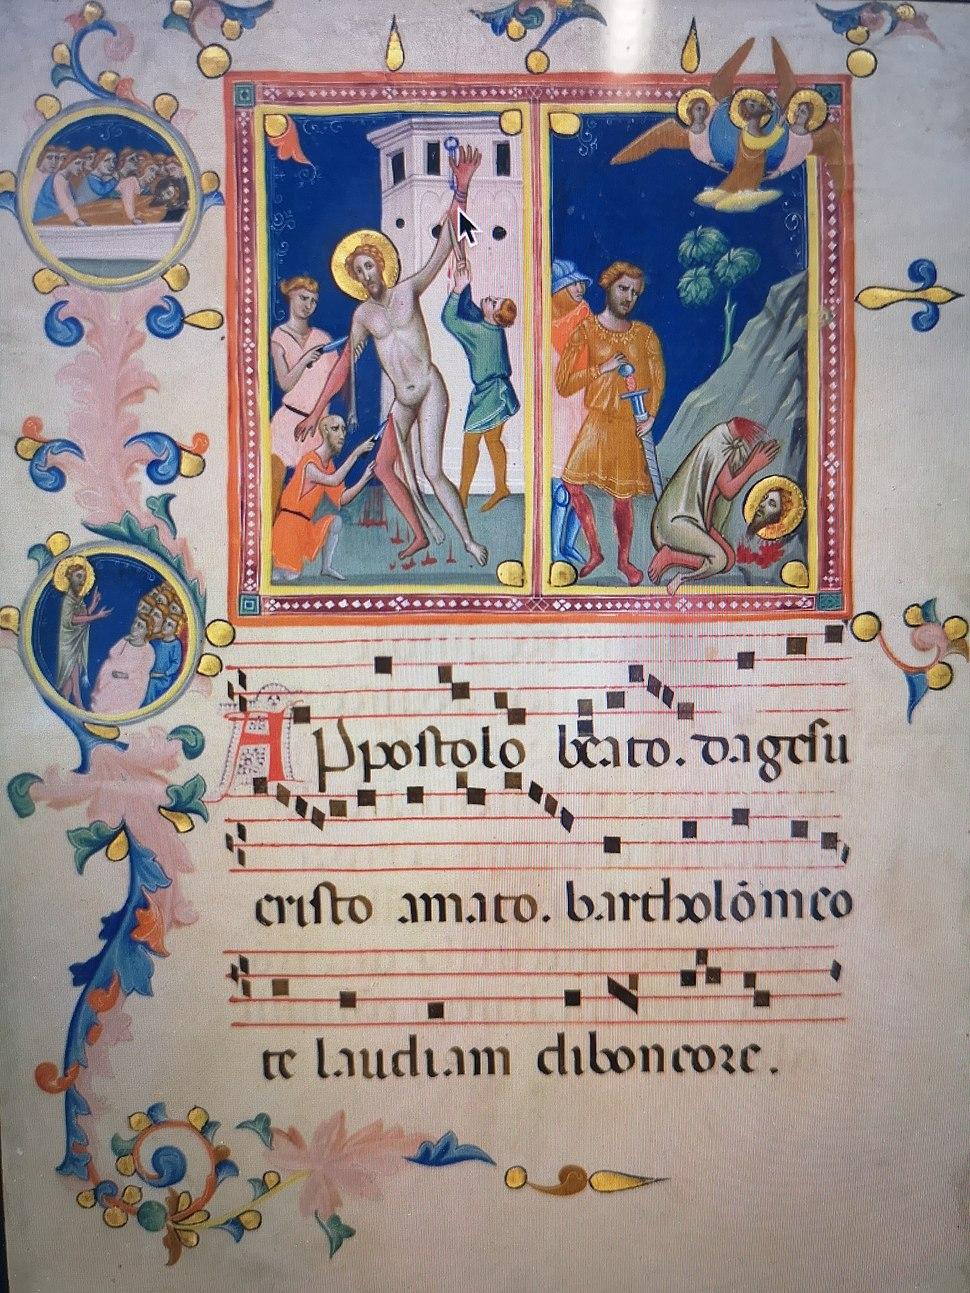 Manuscript Leaf with the Martyrdom of Saint Bartholomew, from a Laudario by Pacino di Bonaguida